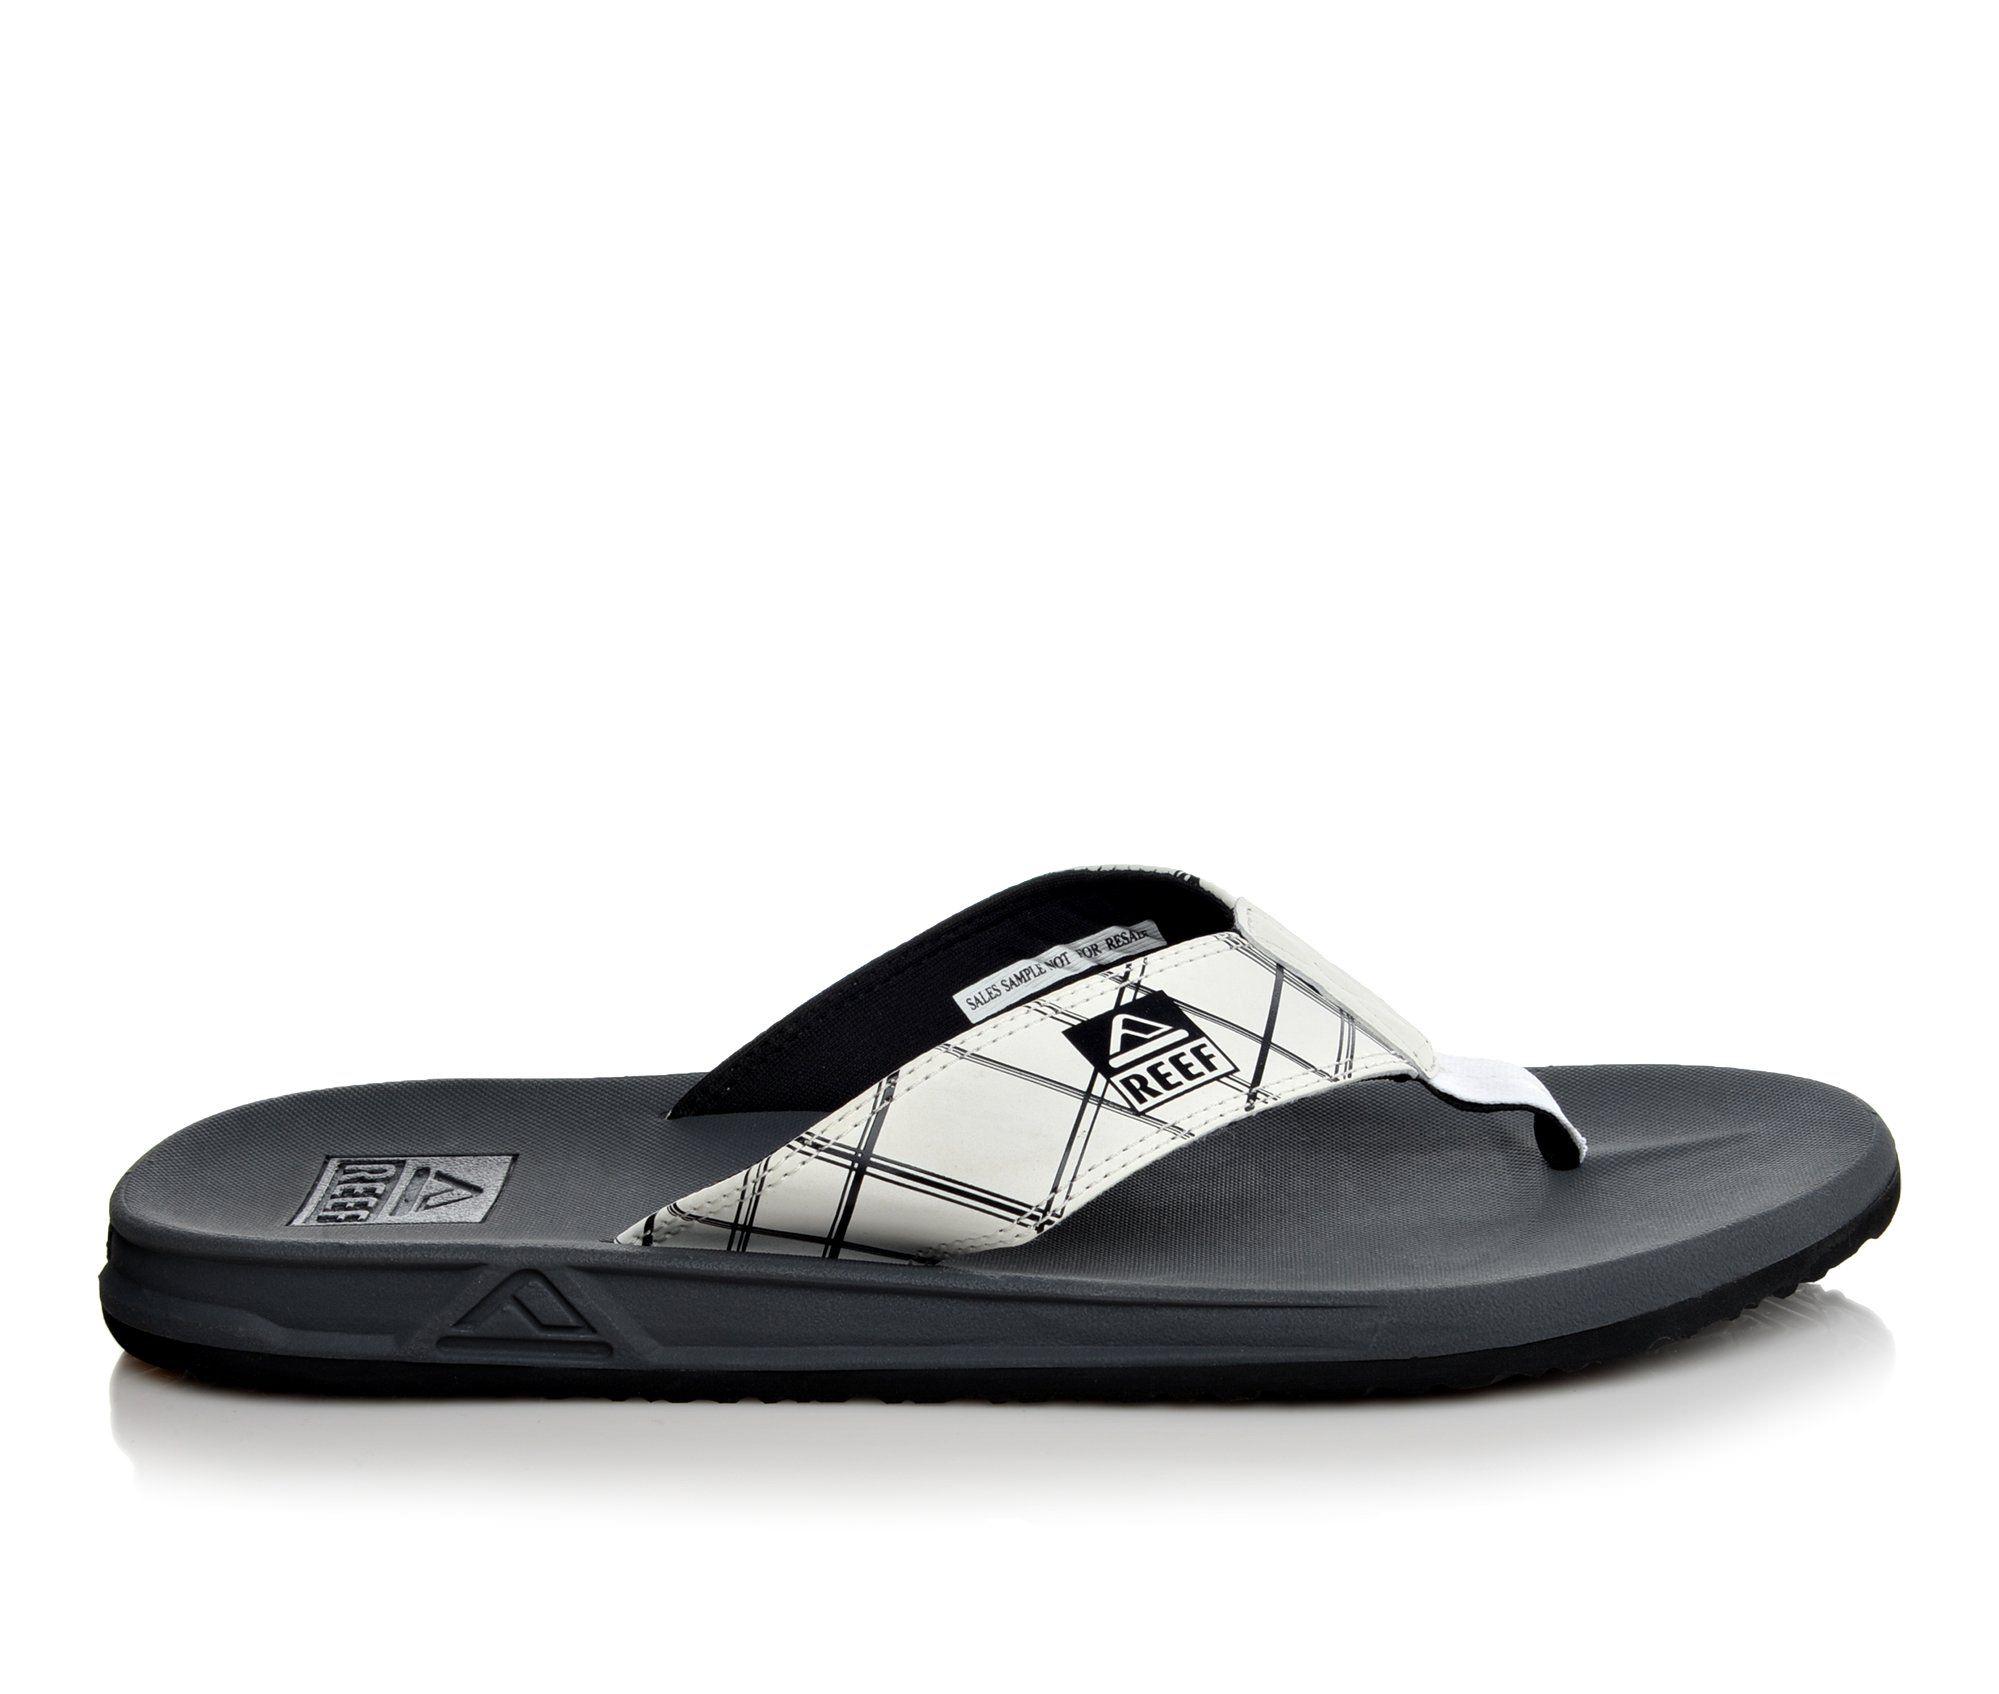 Men's Reef Element Prints Sandals (White)